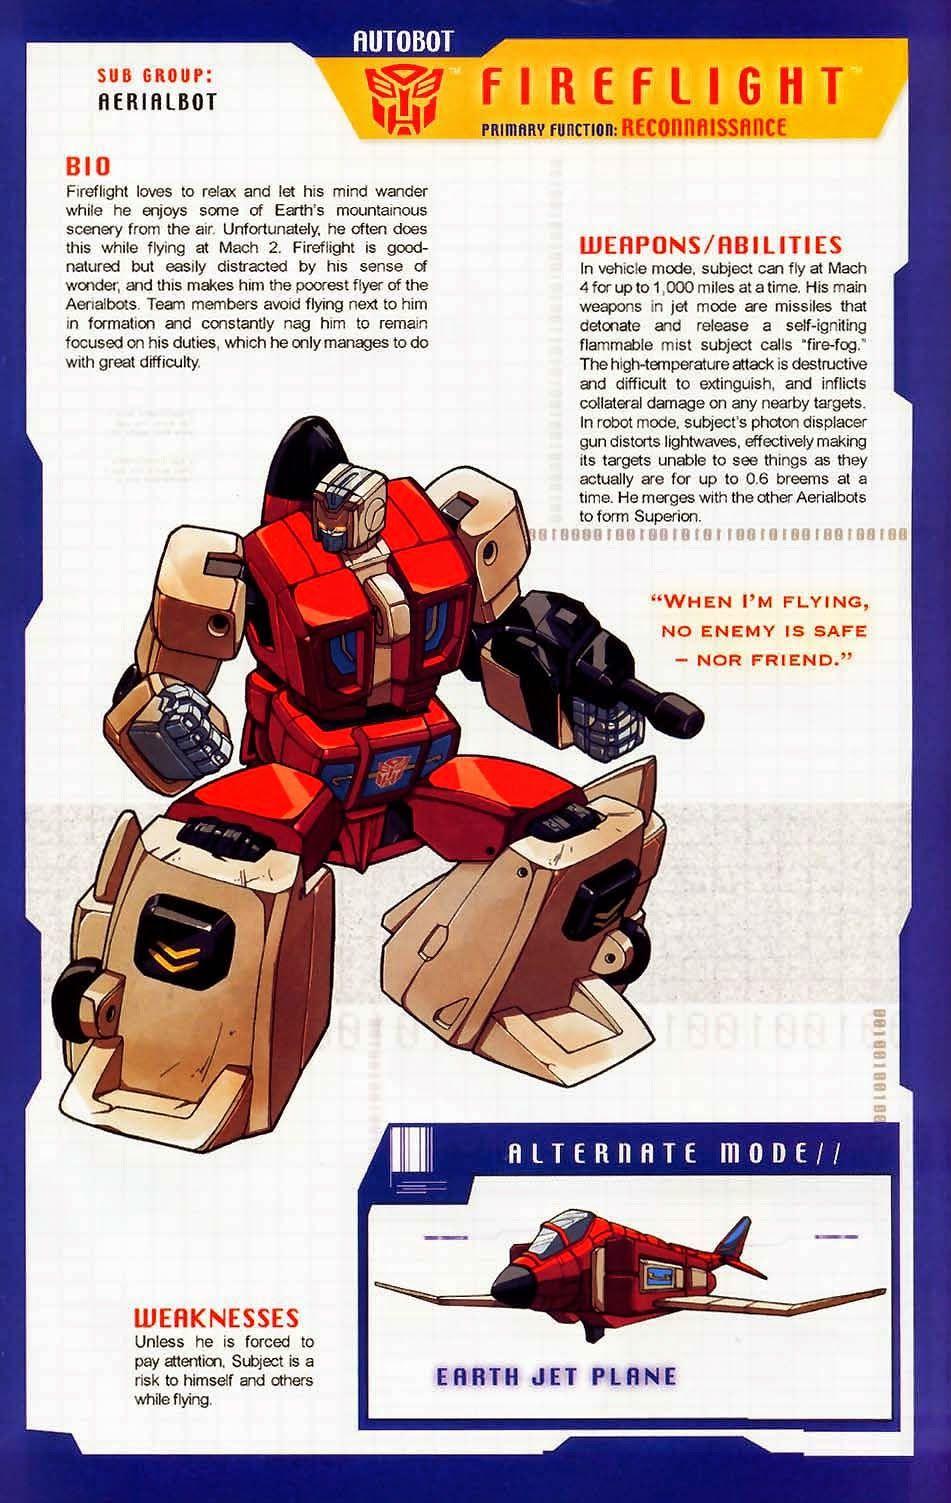 Transformer of the Day: Fireflight